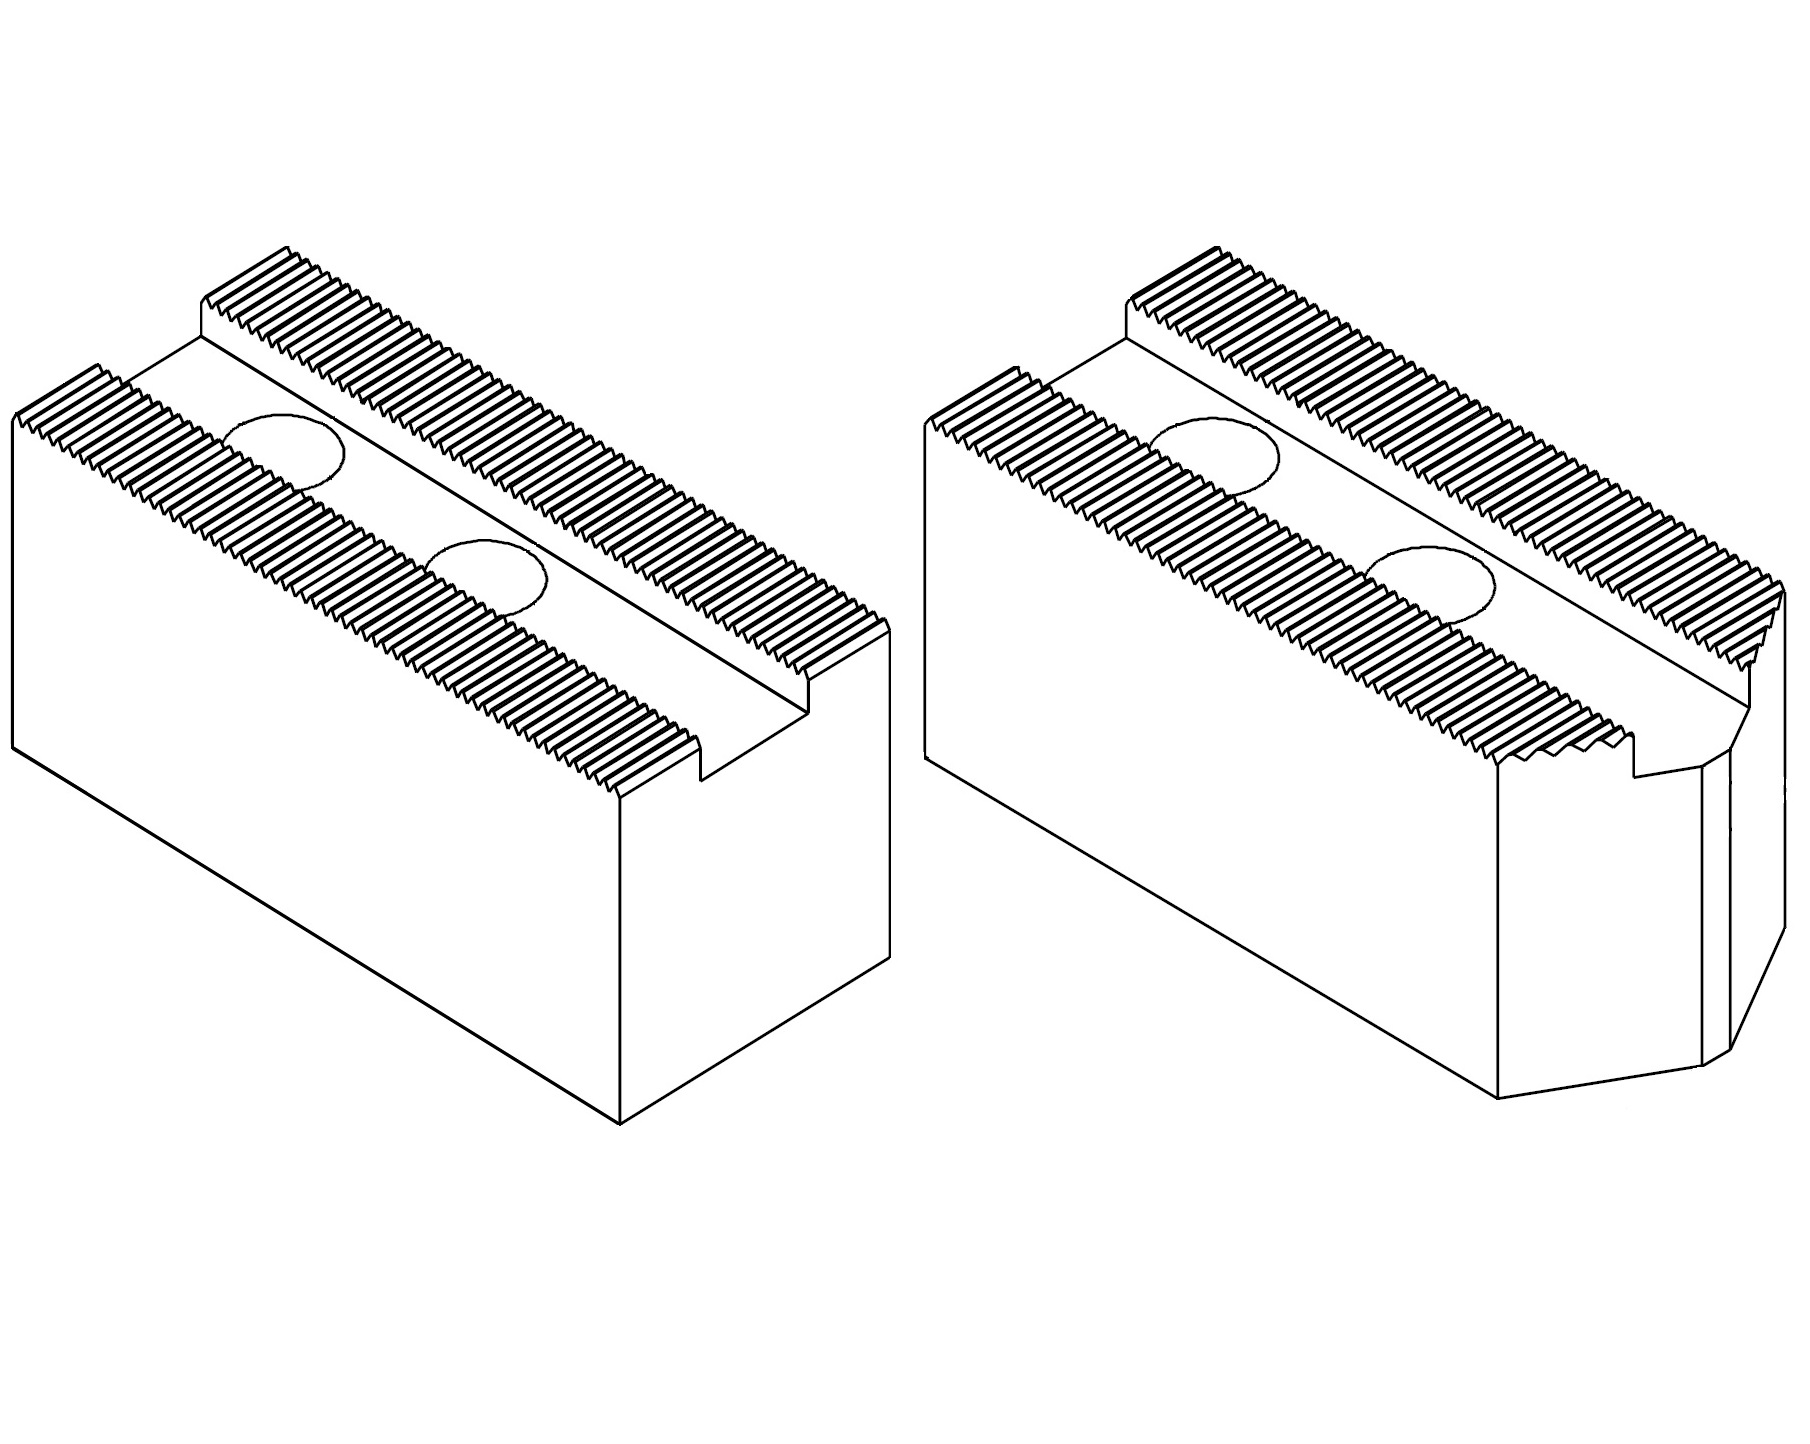 Čelisti měkké 1,5x60°, šířka drážky - 11 (sklíčidla pr. 130-170mm)